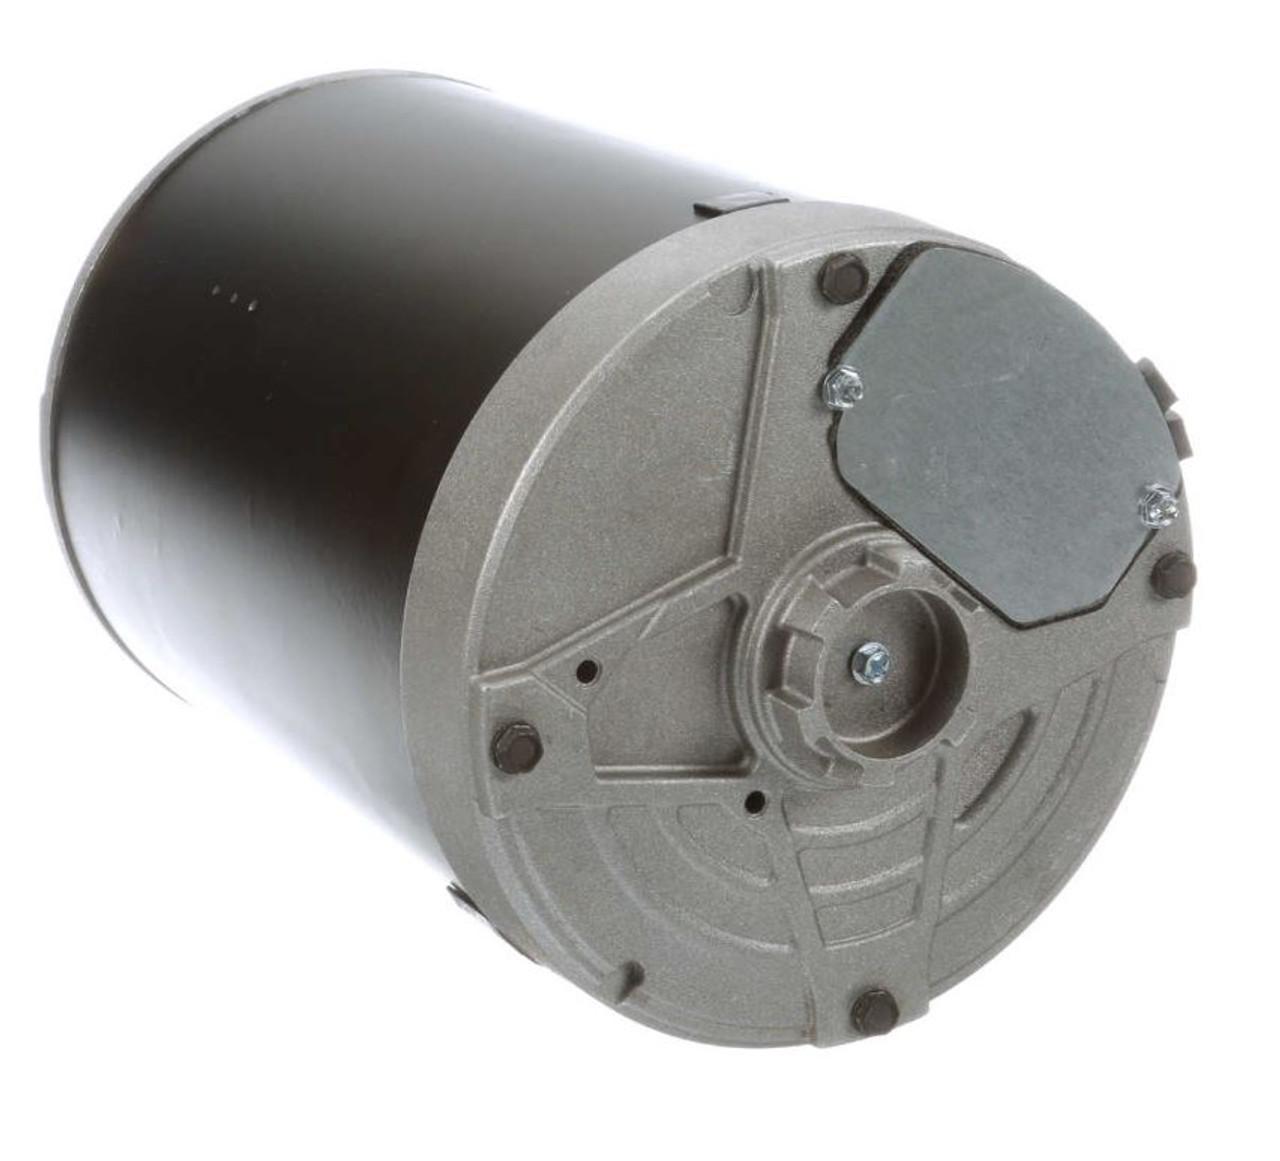 Okr1096v1 Century Krack Refrigeration Motor 1503752 11096 1 2 Hp 1140 Rpm 460 208 230v